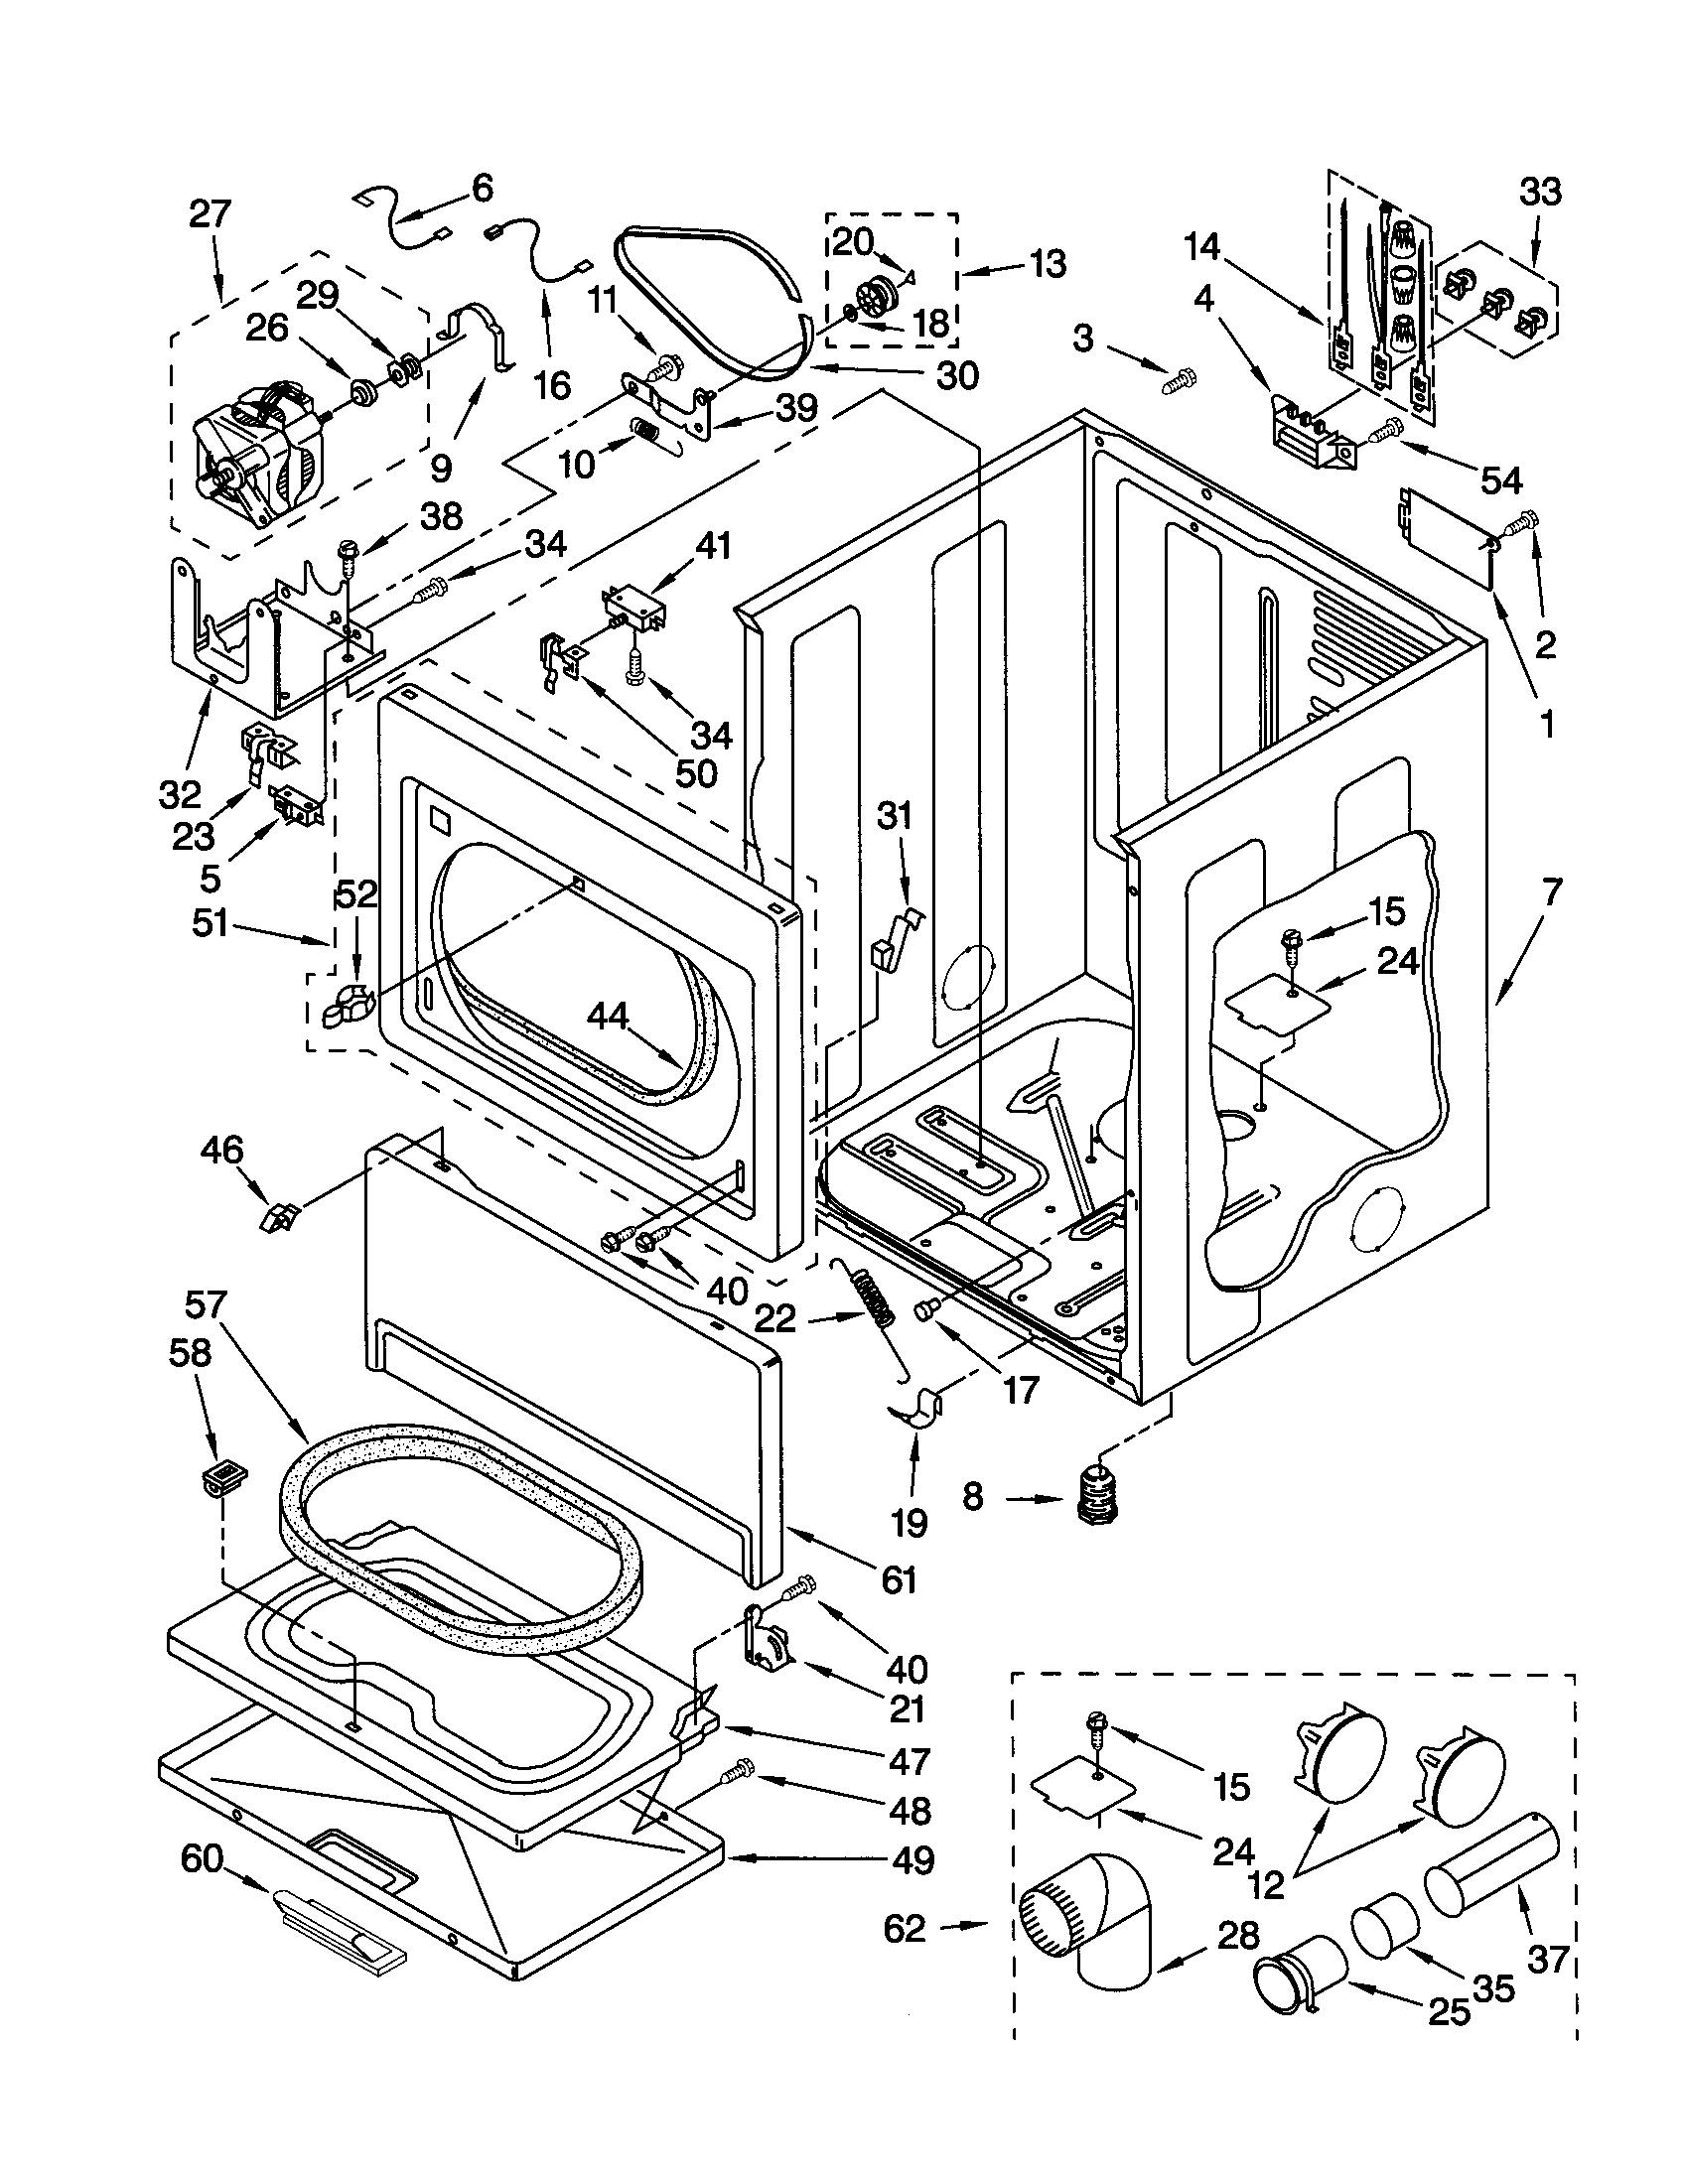 hight resolution of sears dryer wiring diagram wiring diagram looking for kenmore model 11062912100 dryer repair replacement